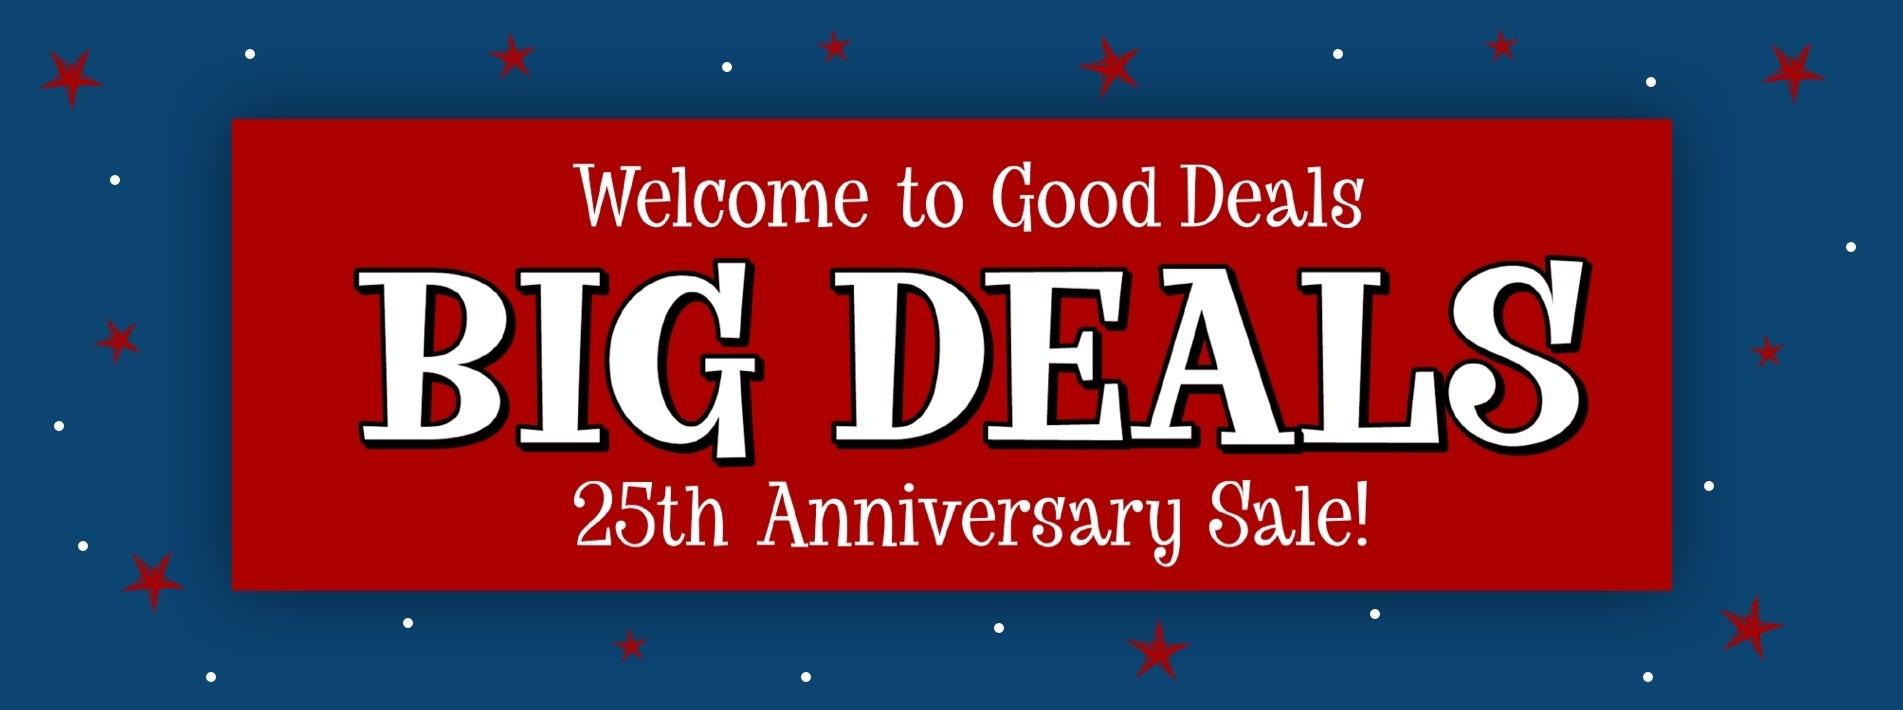 Good Deals 25th Anniversary Sale